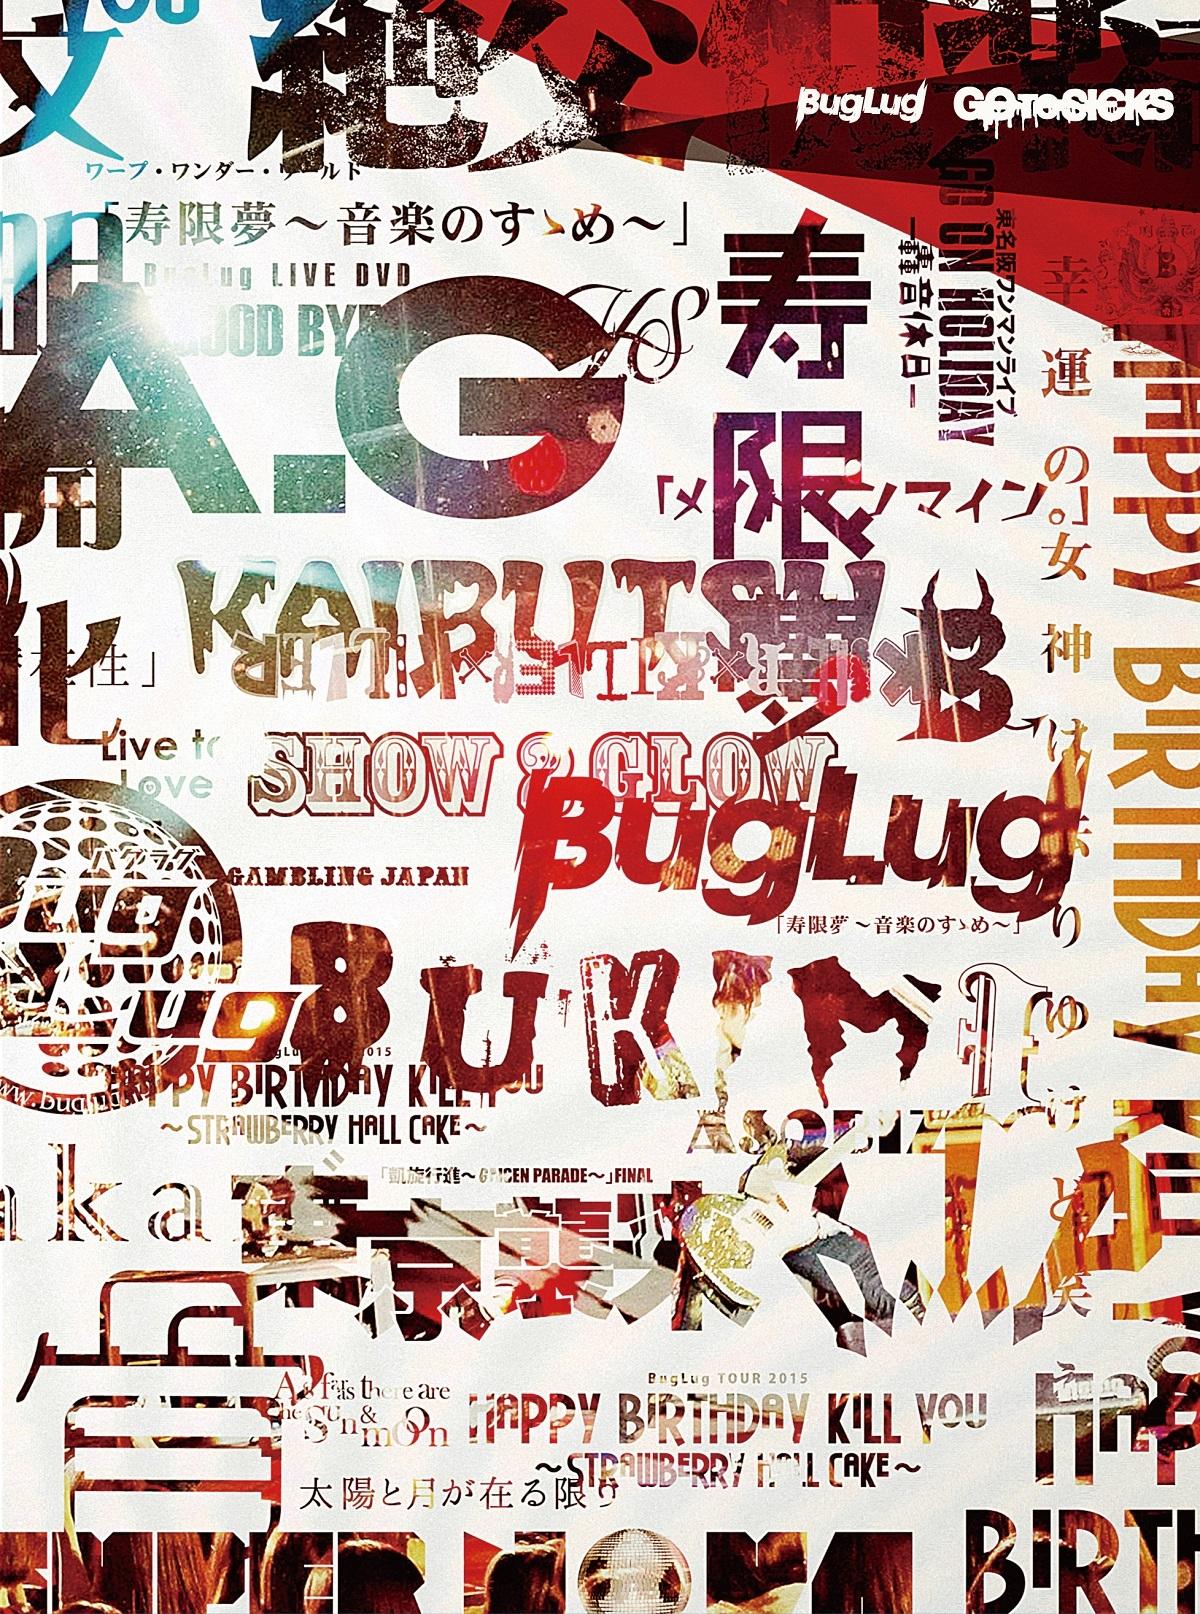 BugLug LIVE DVD『GO TO SICKS』初回限定豪華盤